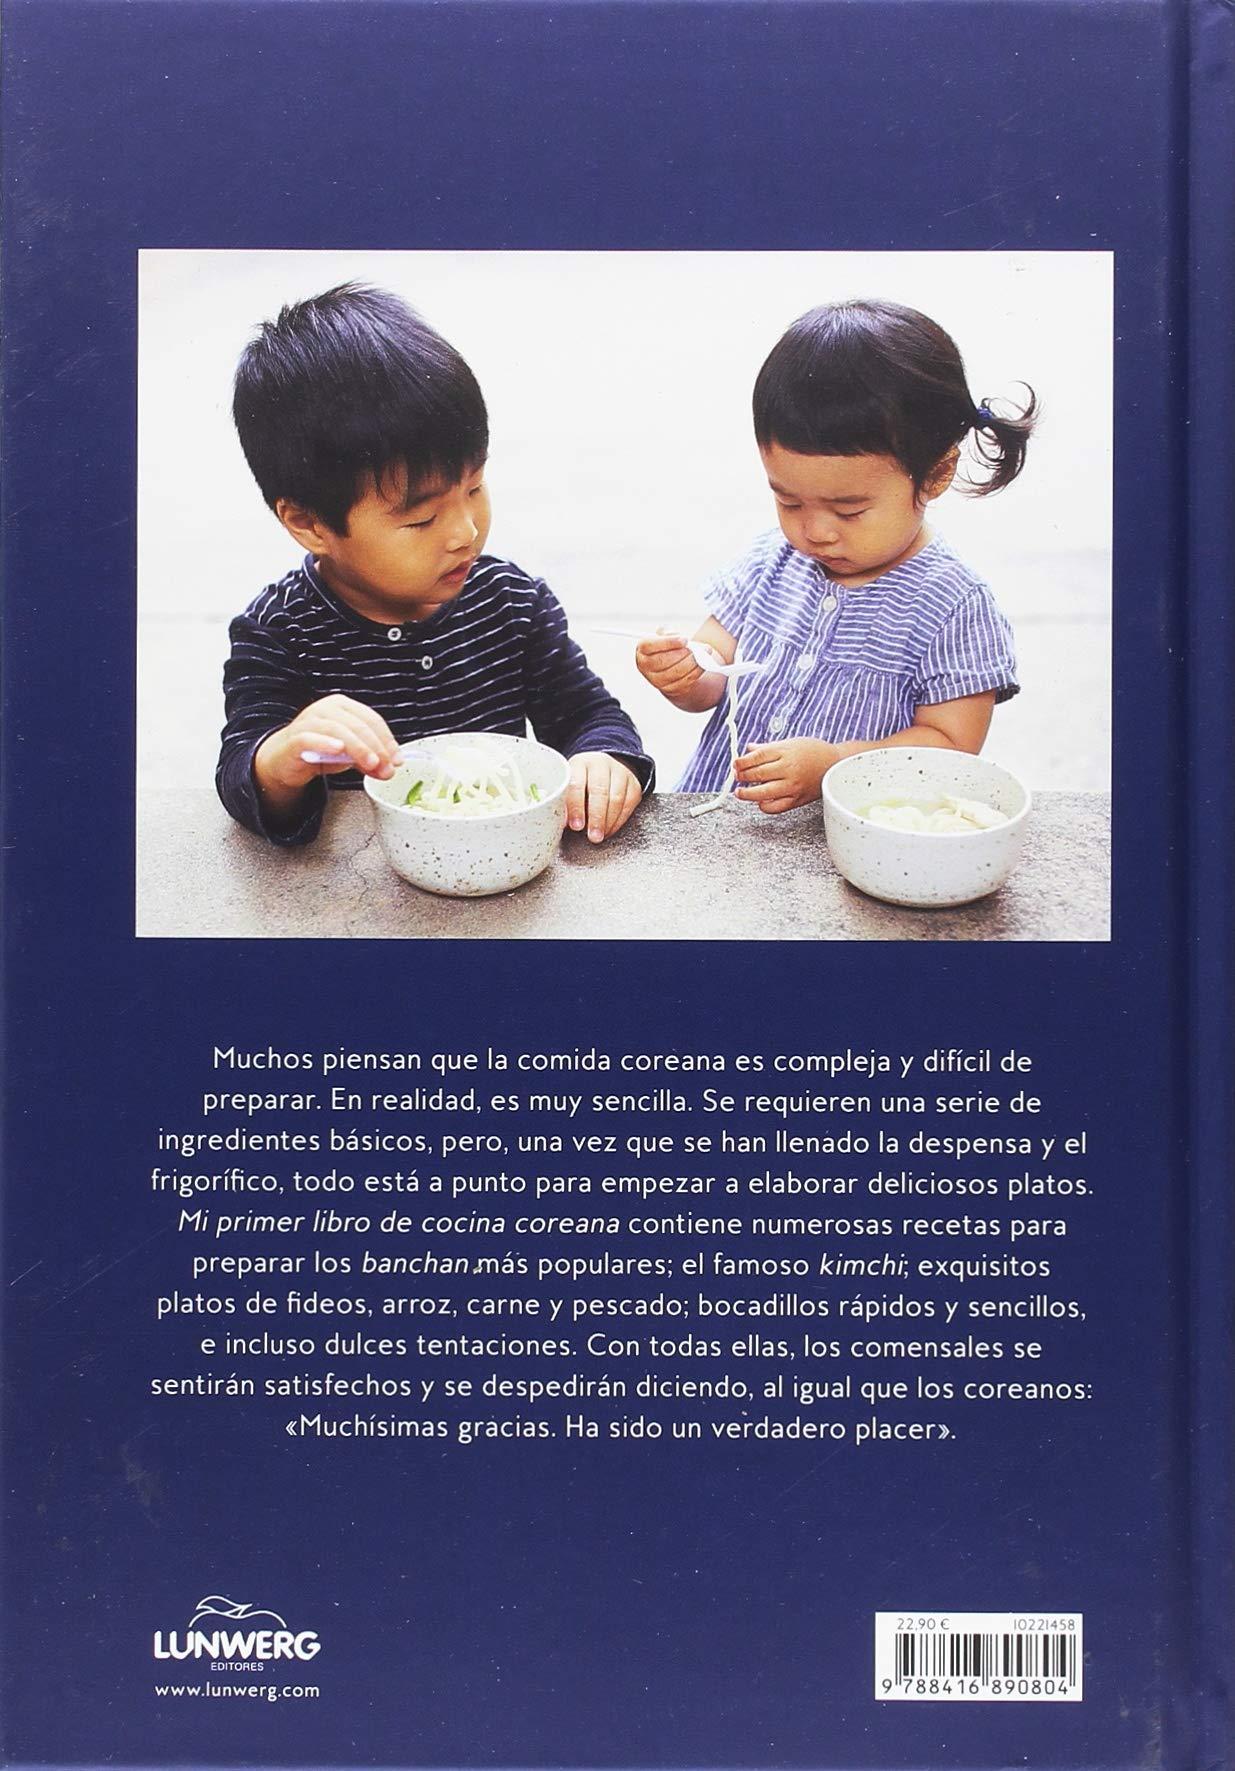 Mi primer libro de cocina coreana (Gastronomía): Amazon.es: Caroline Hwang, Lisa Linder, Gemma Salvà Santanachs: Libros